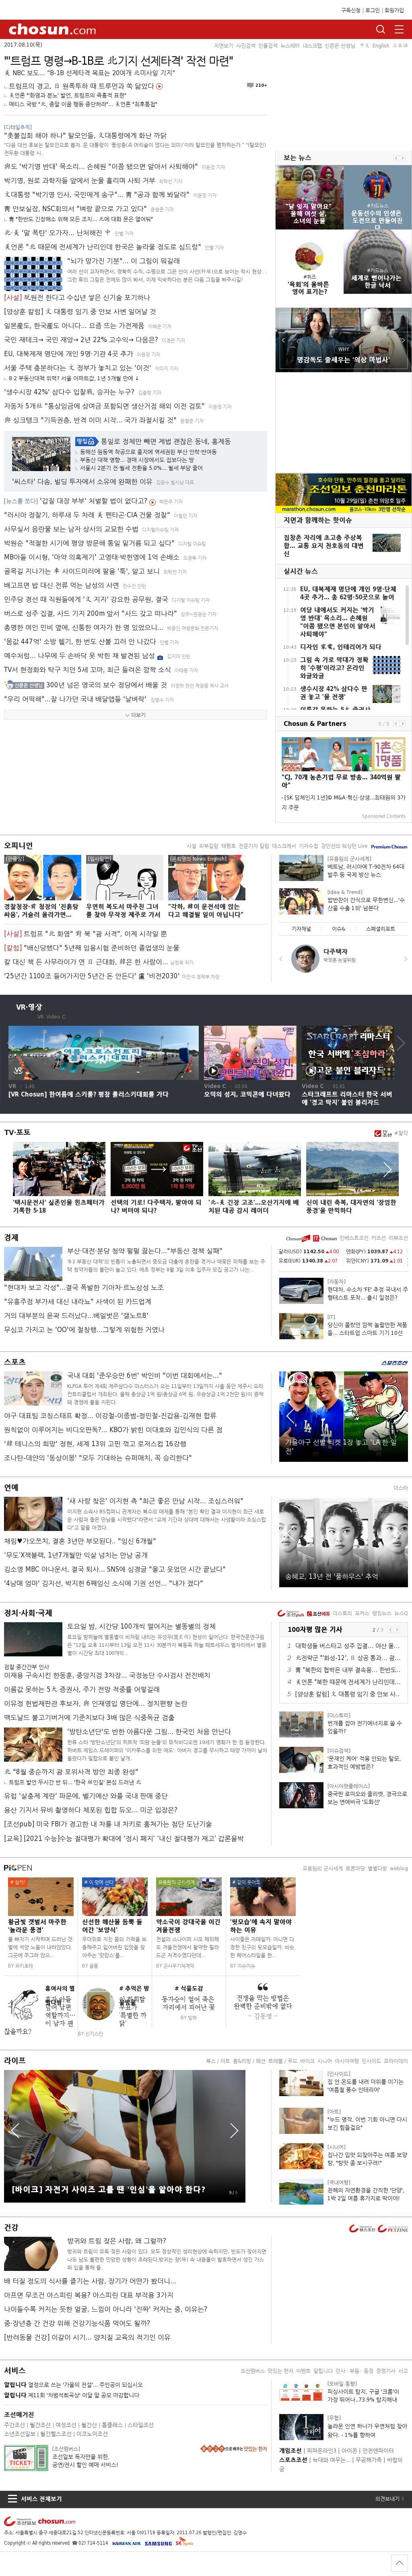 chosun.com at Thursday Aug. 10, 2017, 2:02 p.m. UTC